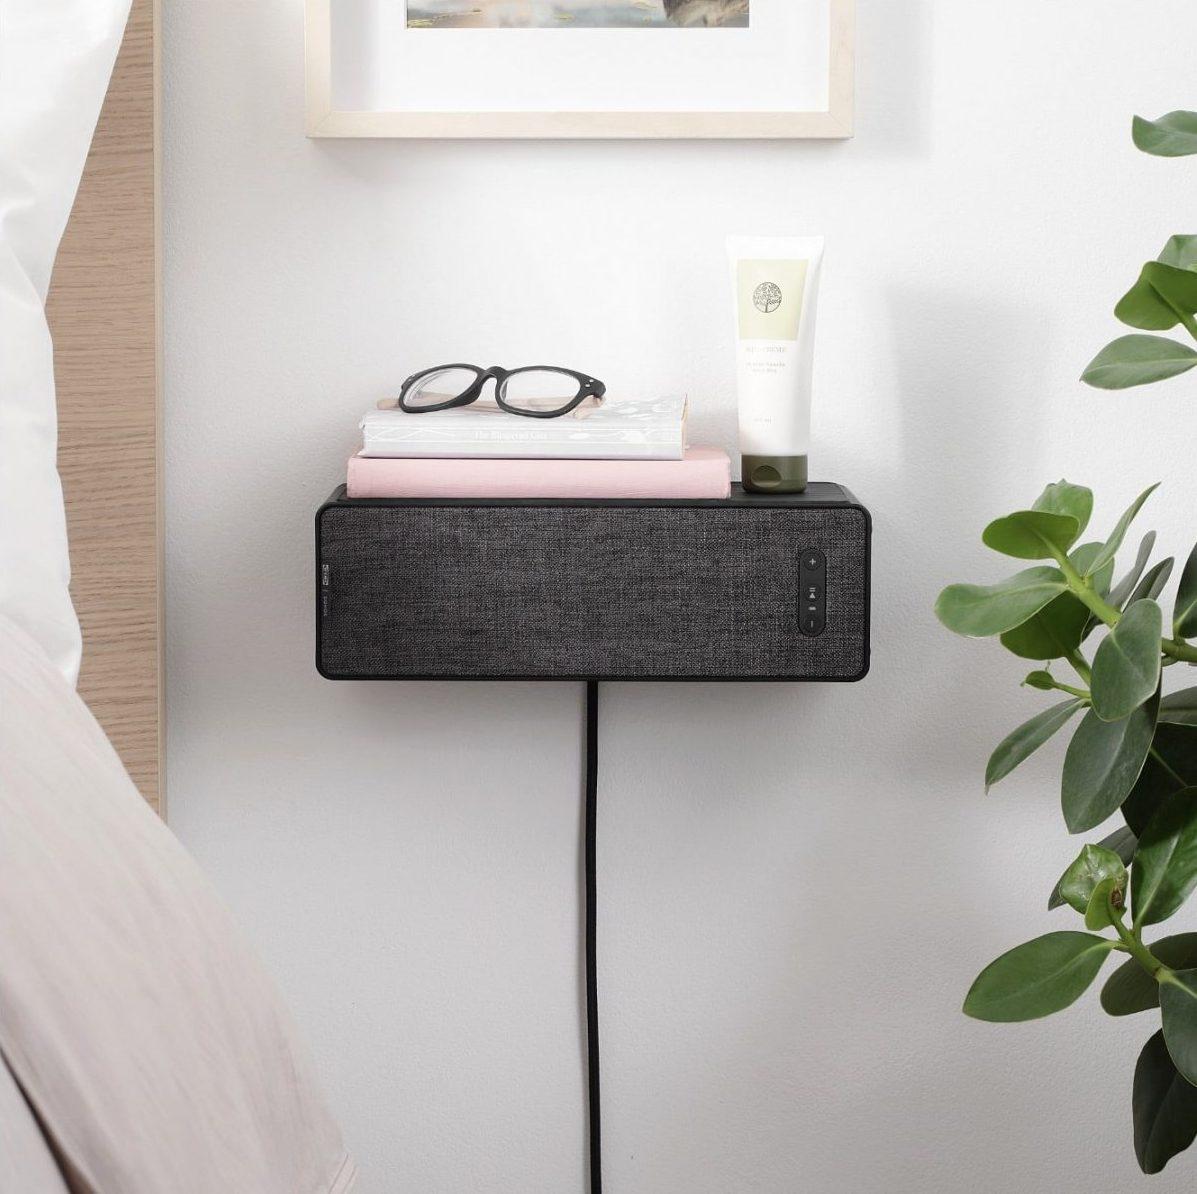 Latest IKEA product IKEA SYMFONISK WiFi bookshelf speaker